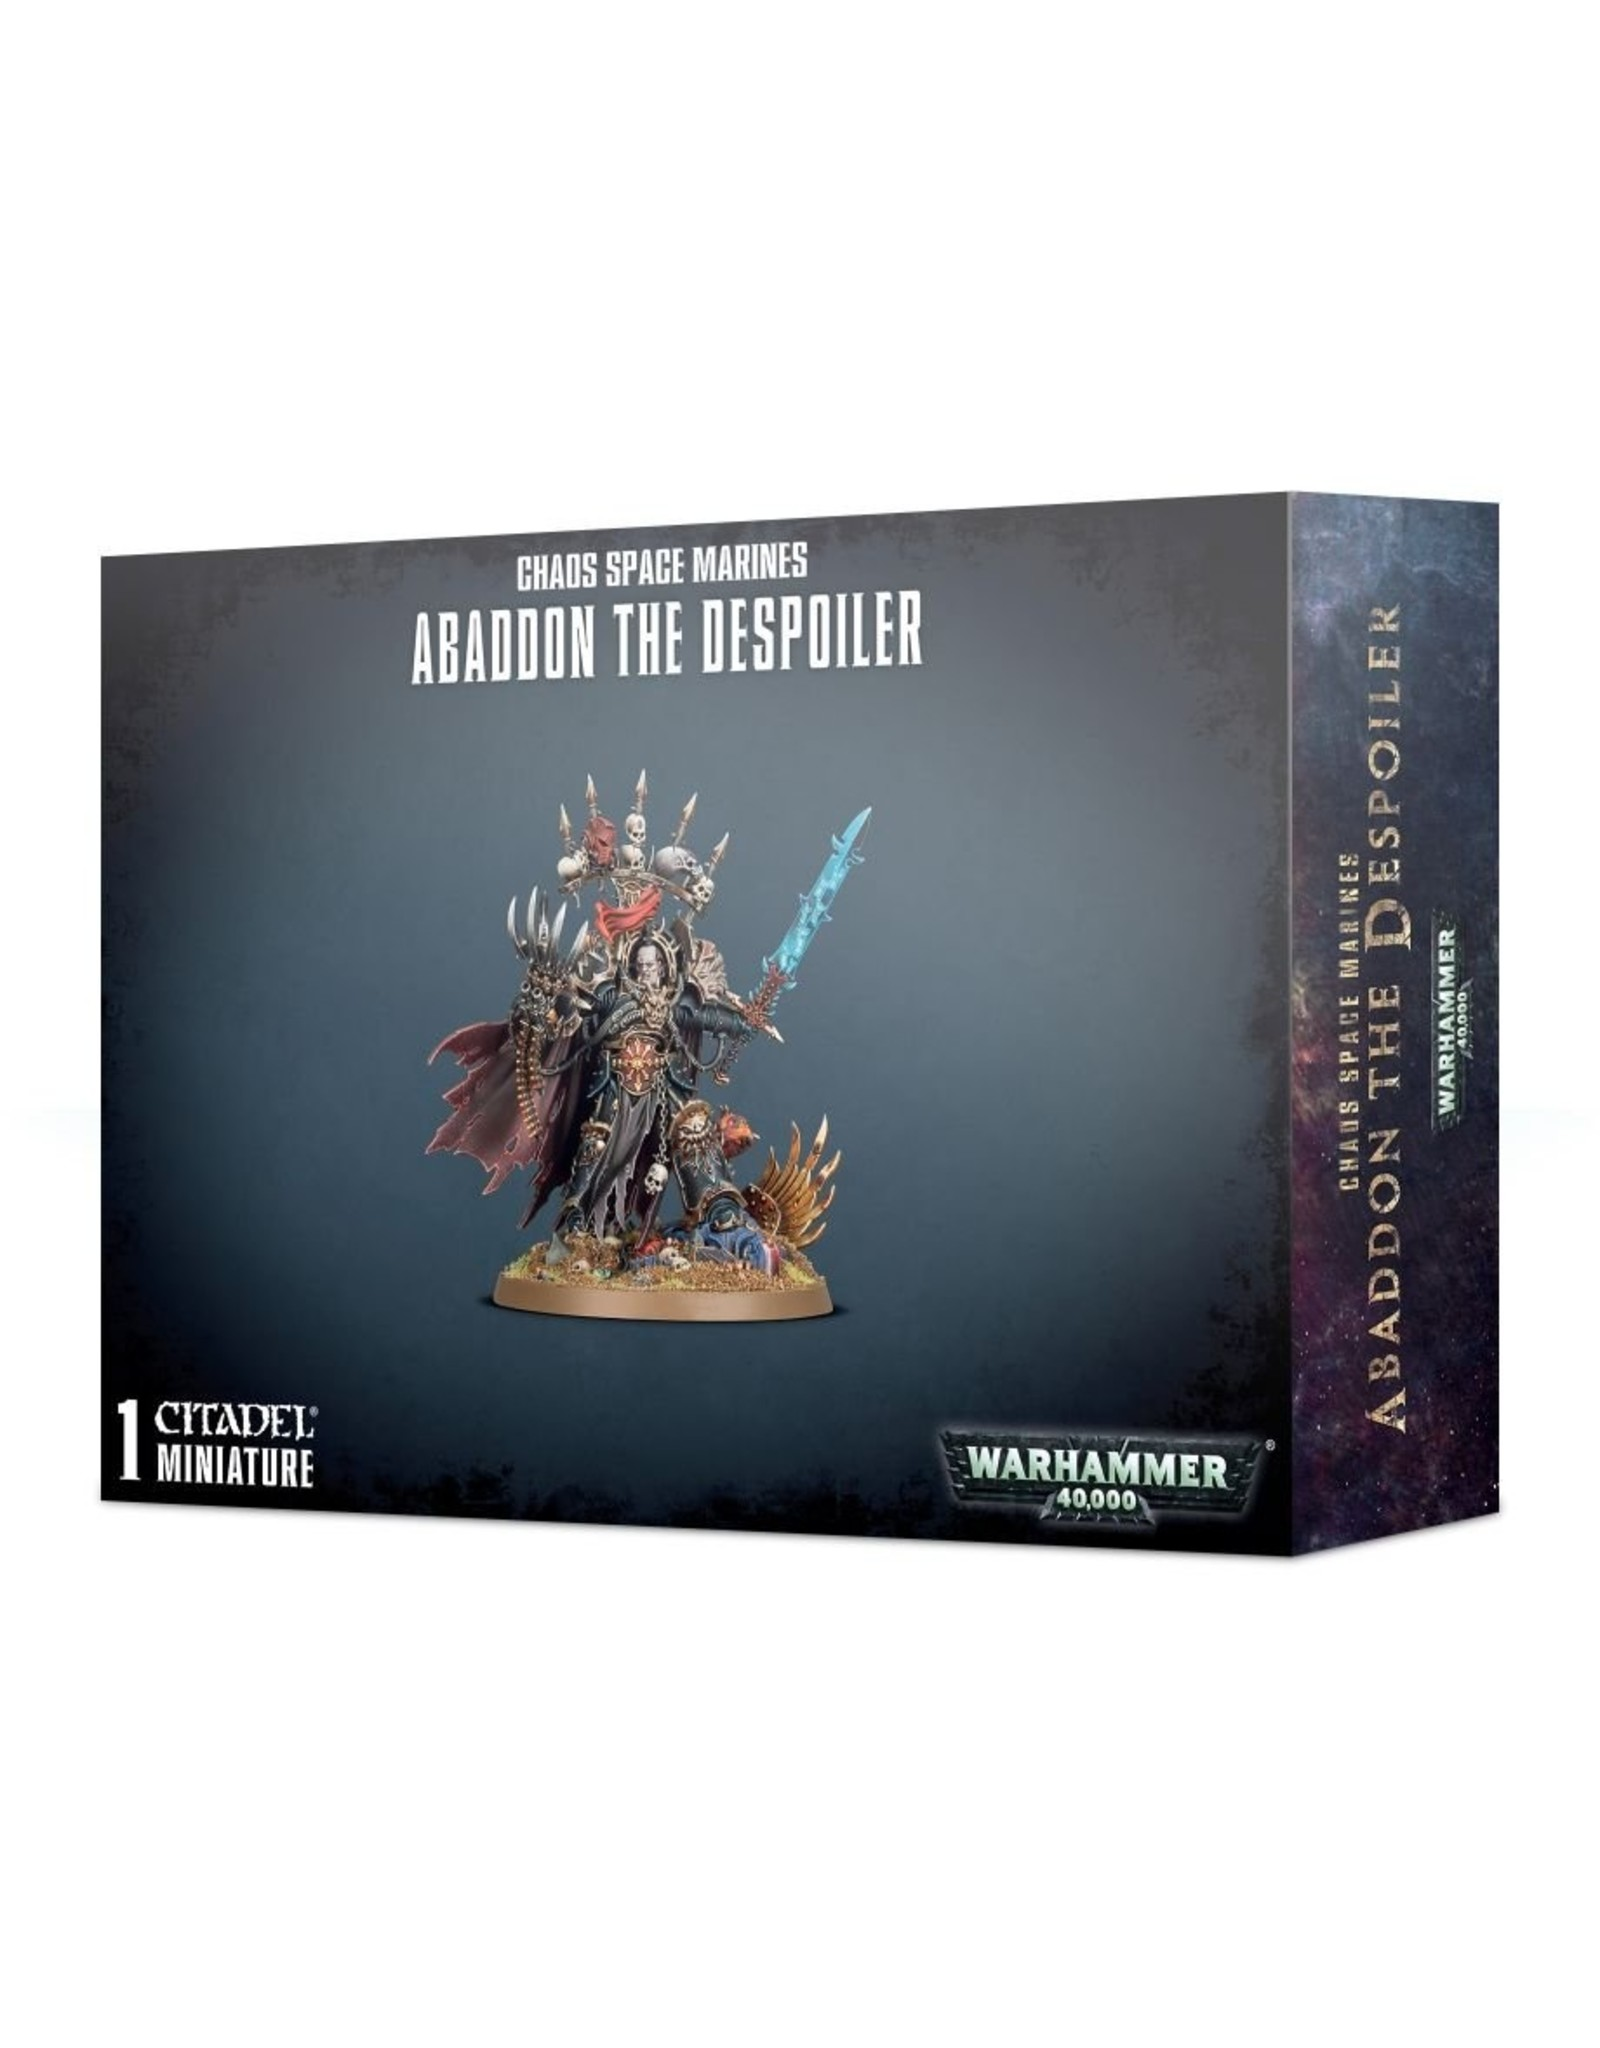 Warhammer 40K: Chaos Space Marine Abaddon the Despoiler